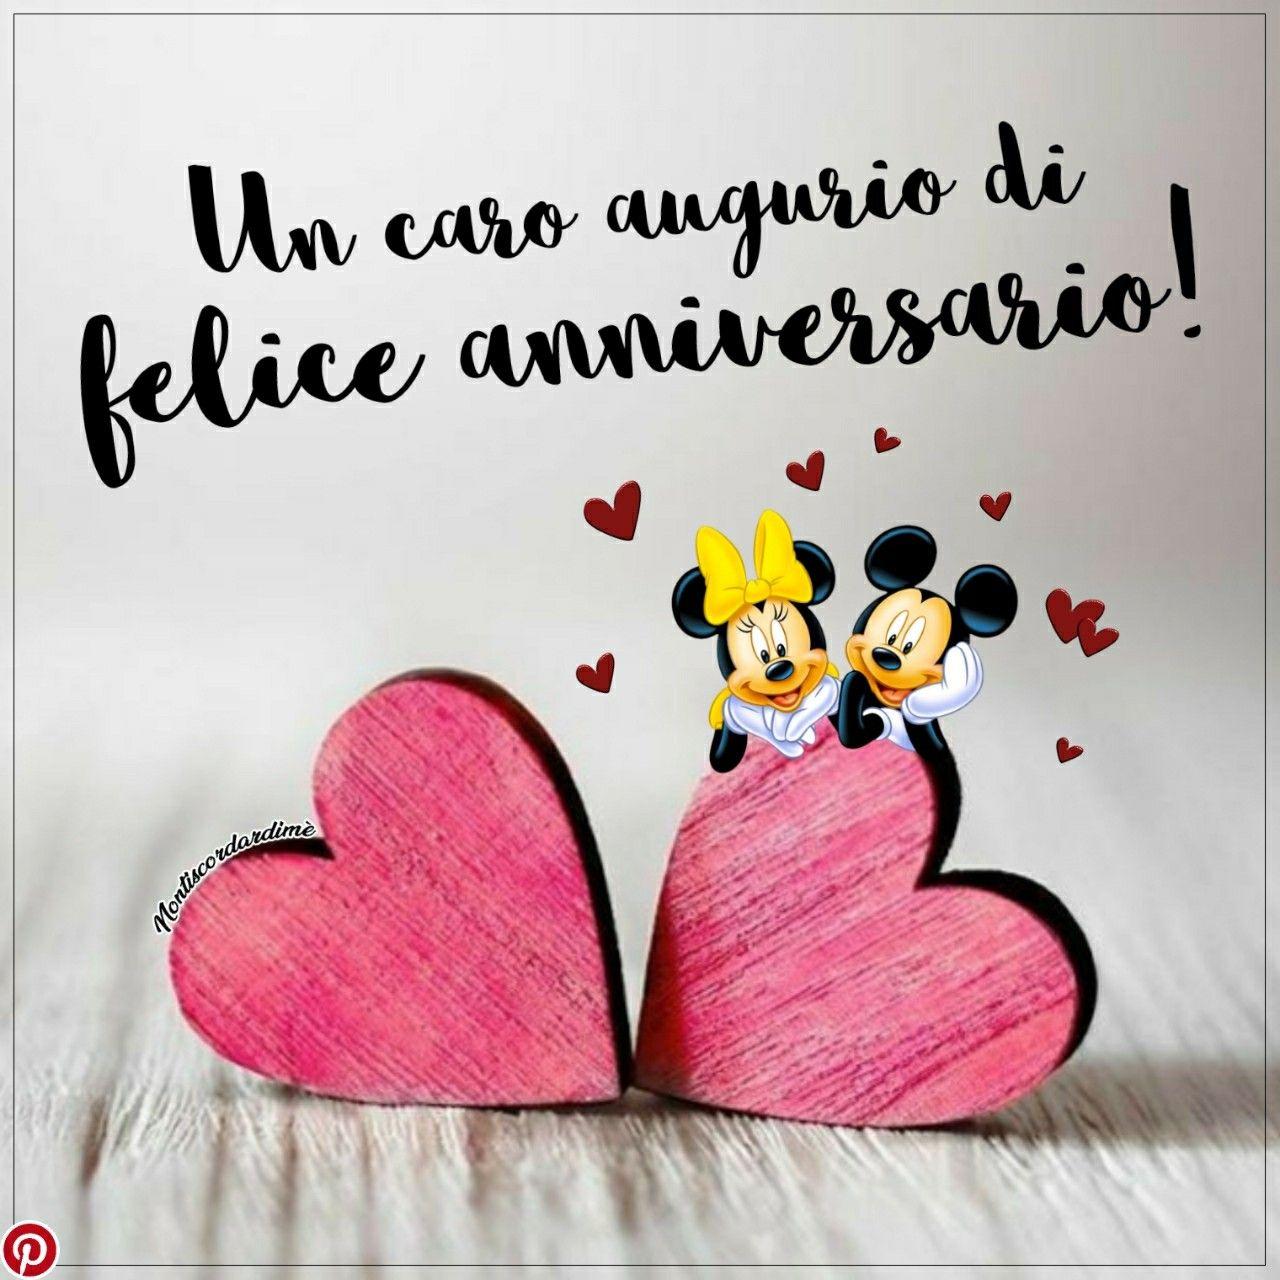 Anniversario Matrimonio Snoopy.Felice Anniversario Anniversario Matrimonio Graziella Oui